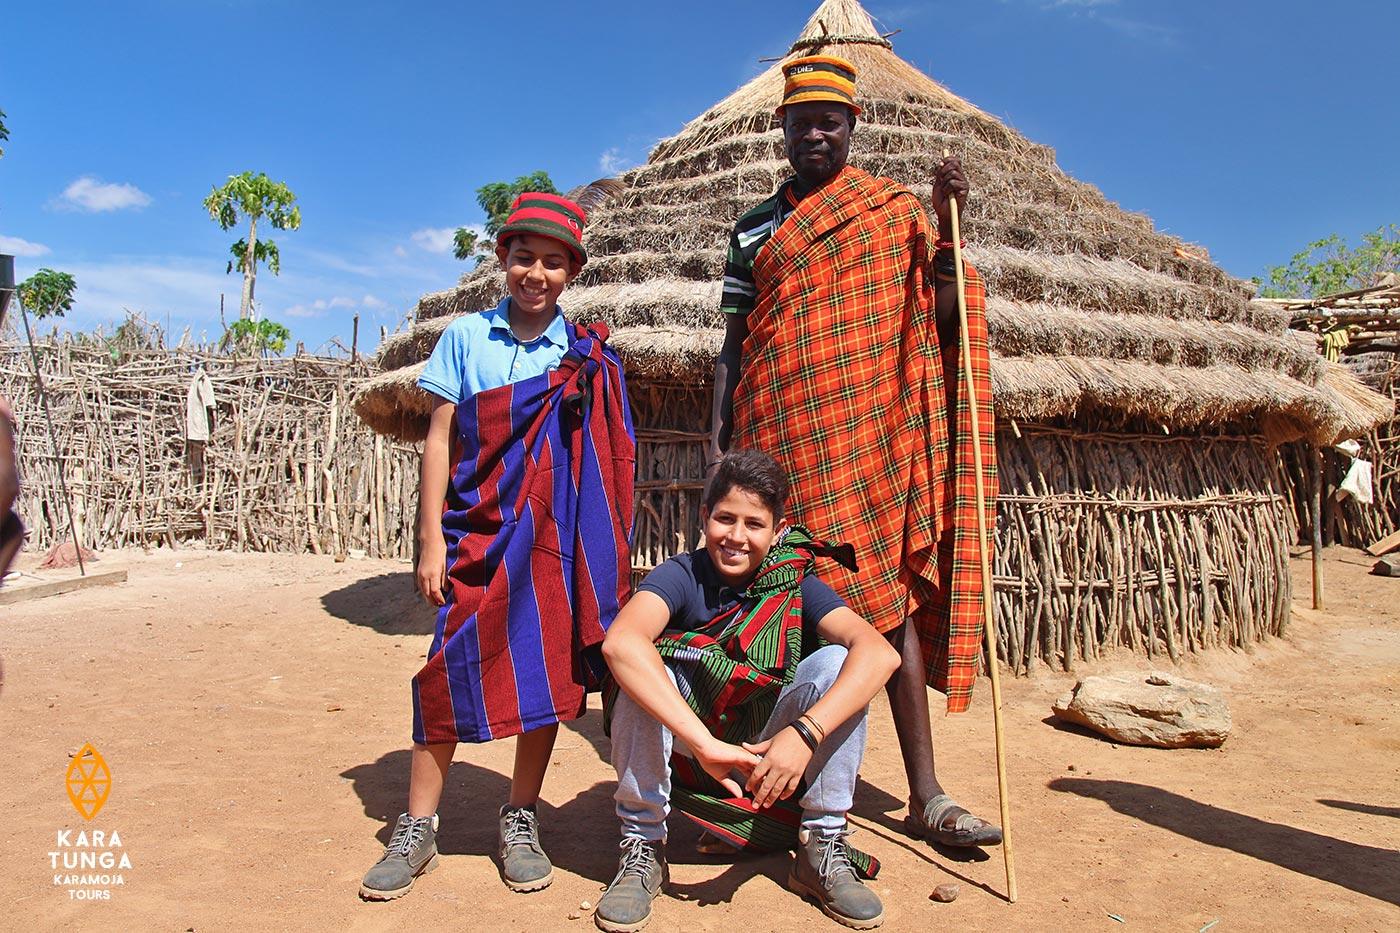 kara-tunga-karamoja-tours-travel-safari-children-6